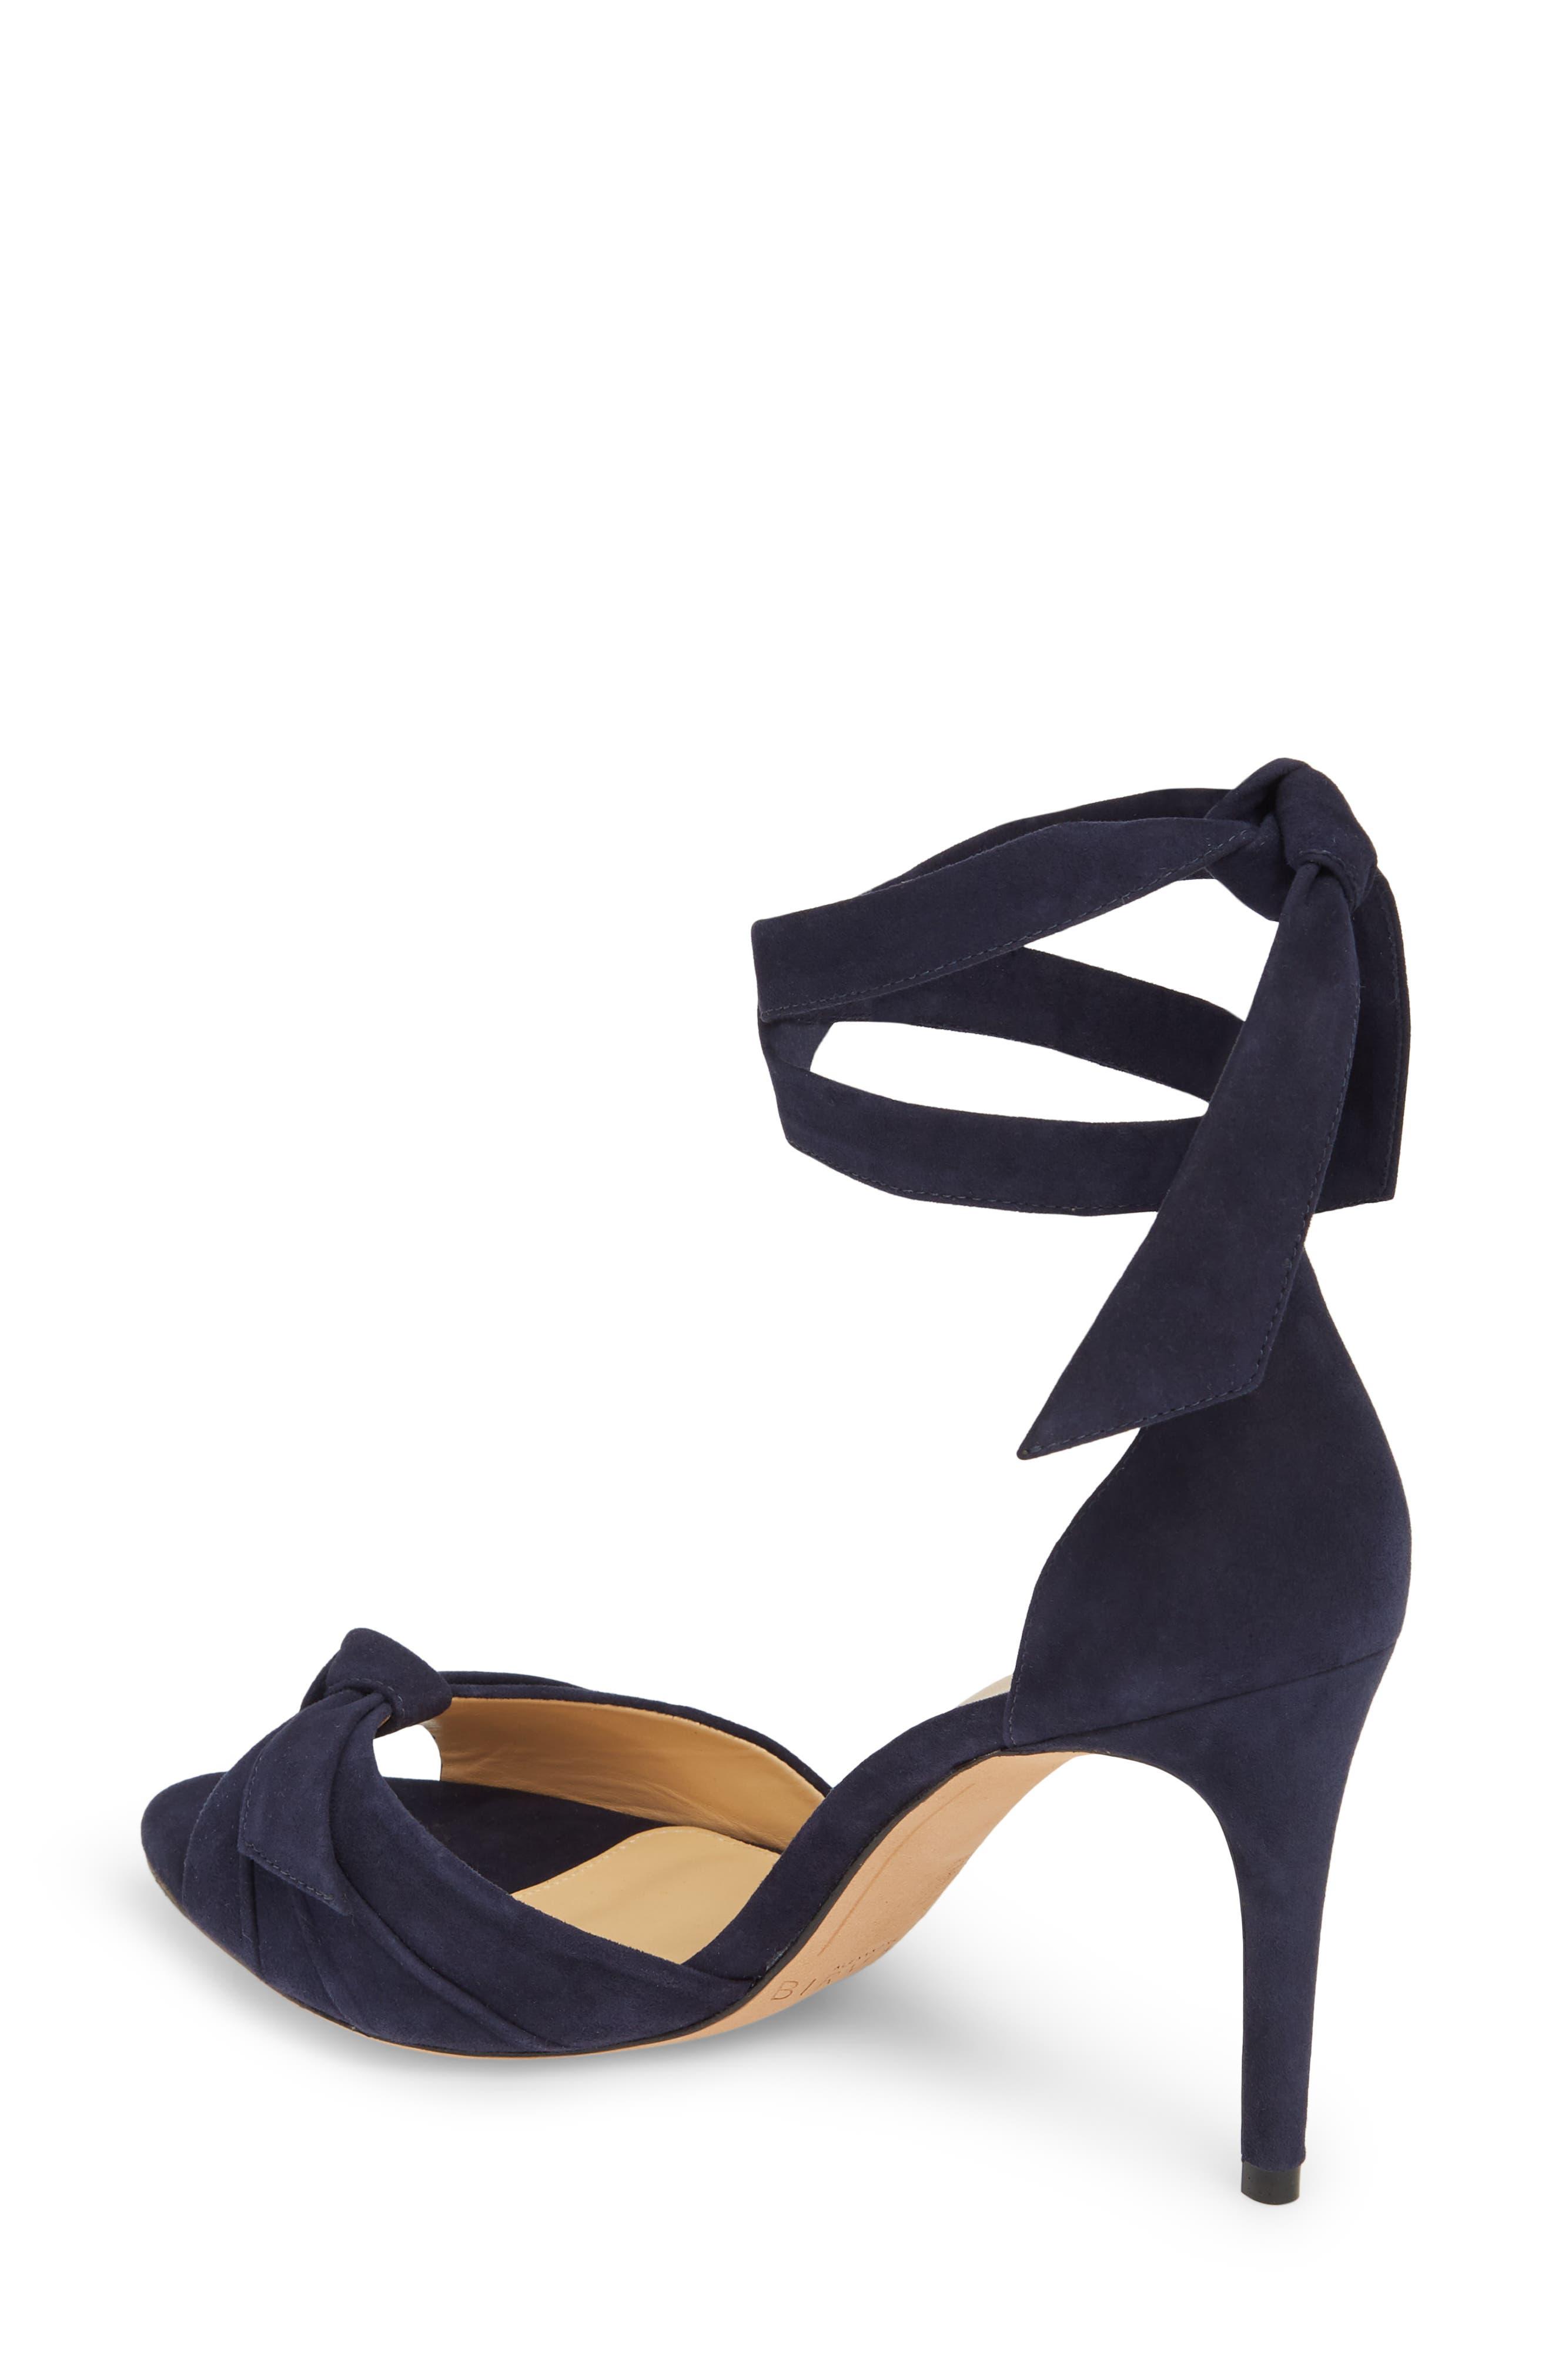 Clarita Ankle Tie Sandal,                             Alternate thumbnail 2, color,                             NIGHT SHADE